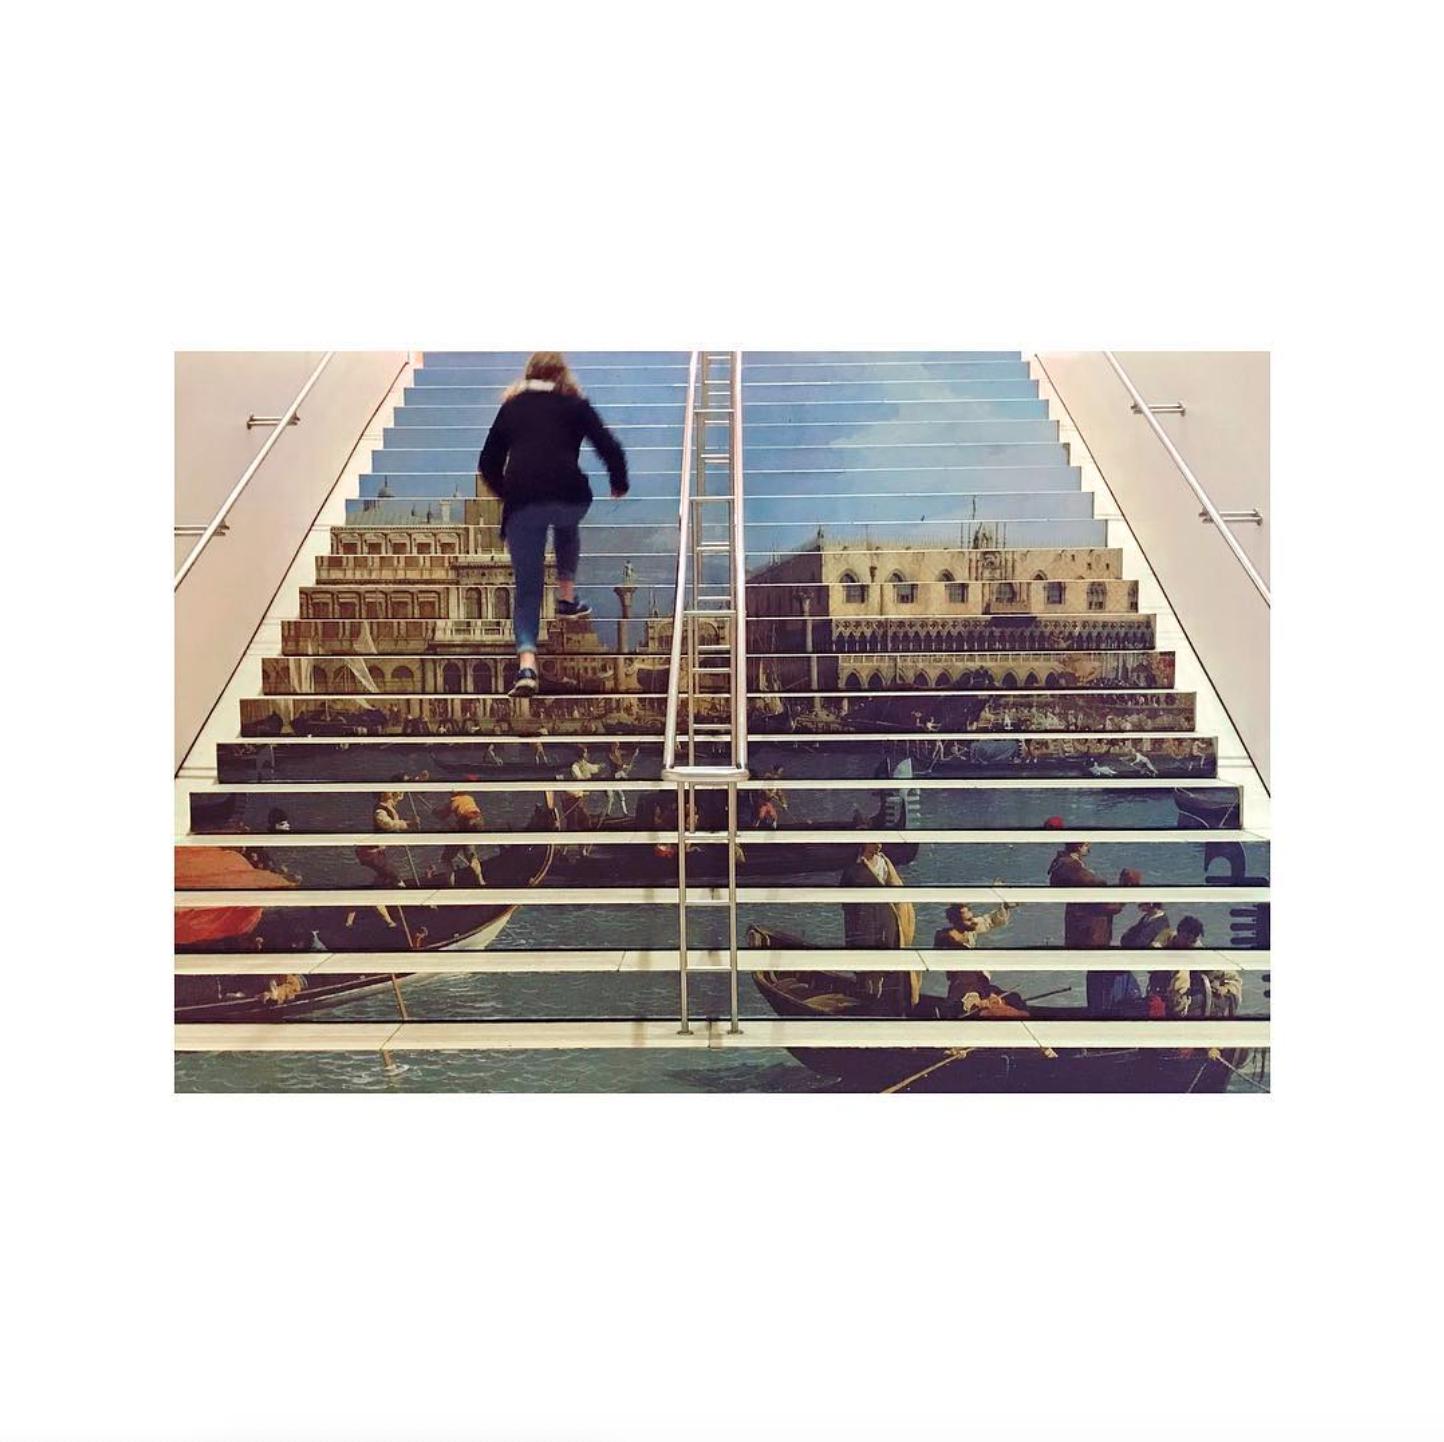 National Gallery of Ireland, Dublin – IRL